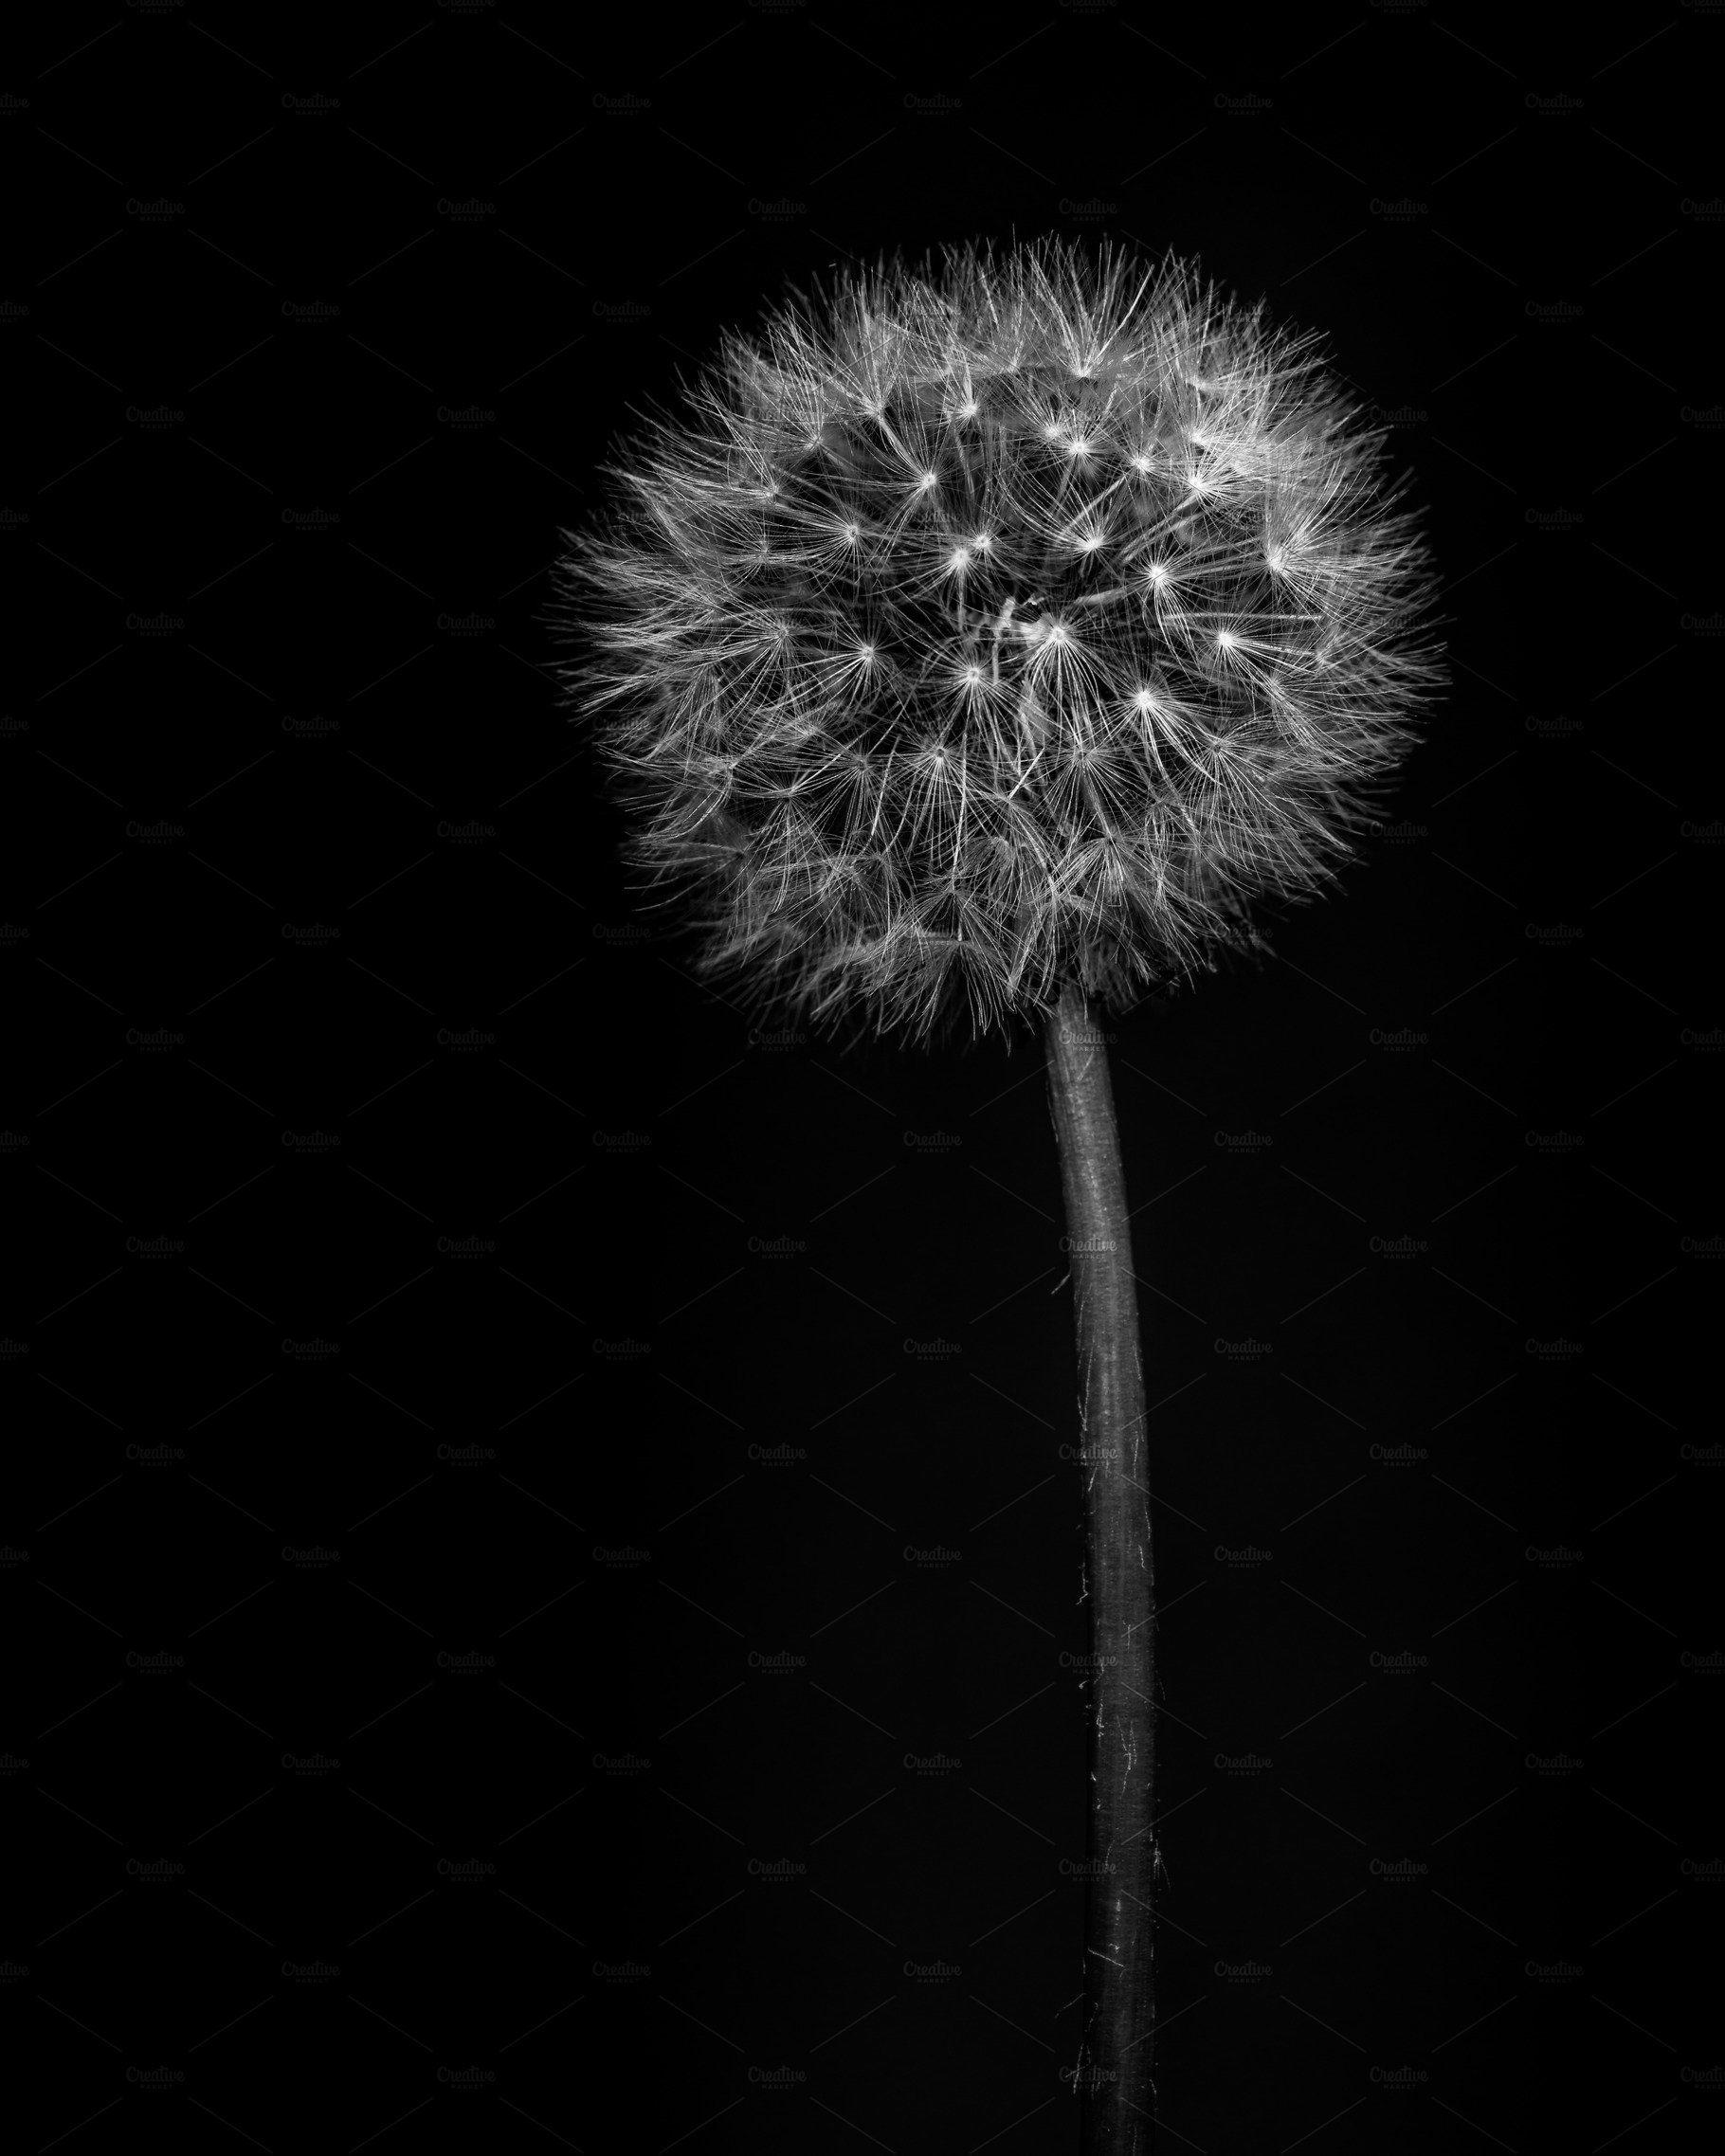 Black And White Dandelion In 2020 White Dandelion Dandelion Black And White